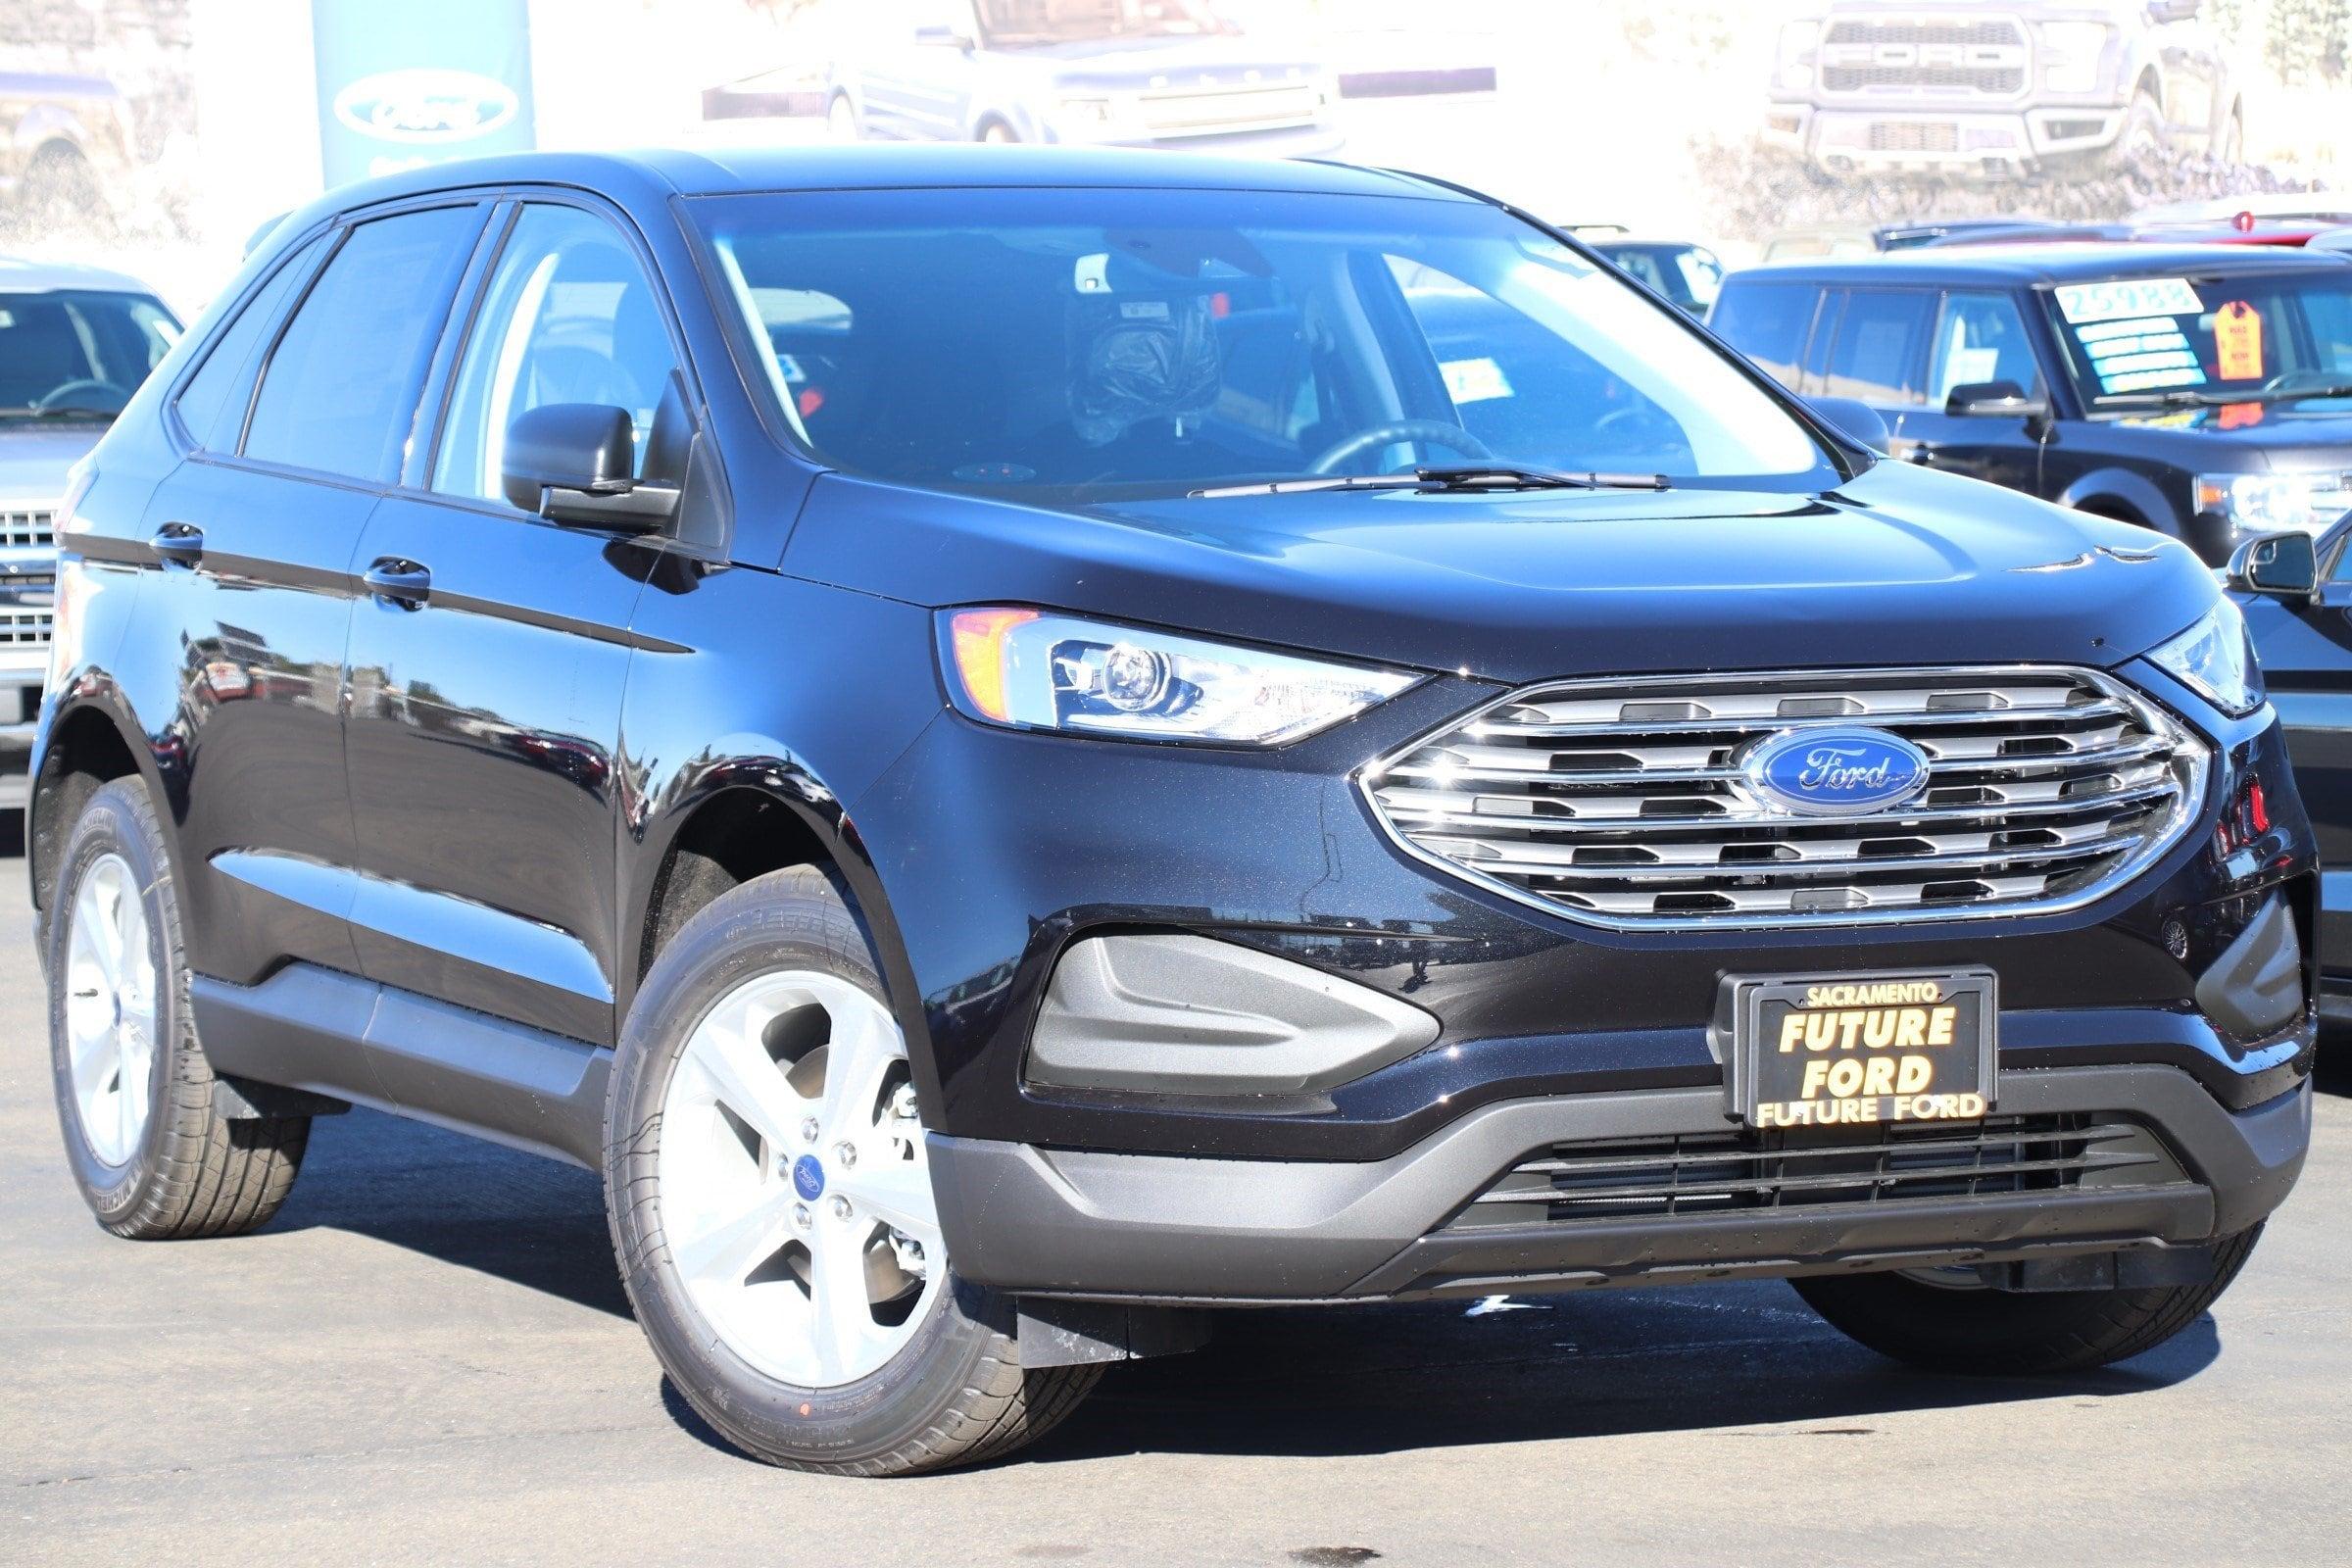 Future Ford Sacramento >> New 2019 Ford Edge For Sale At Future Automotive Vin